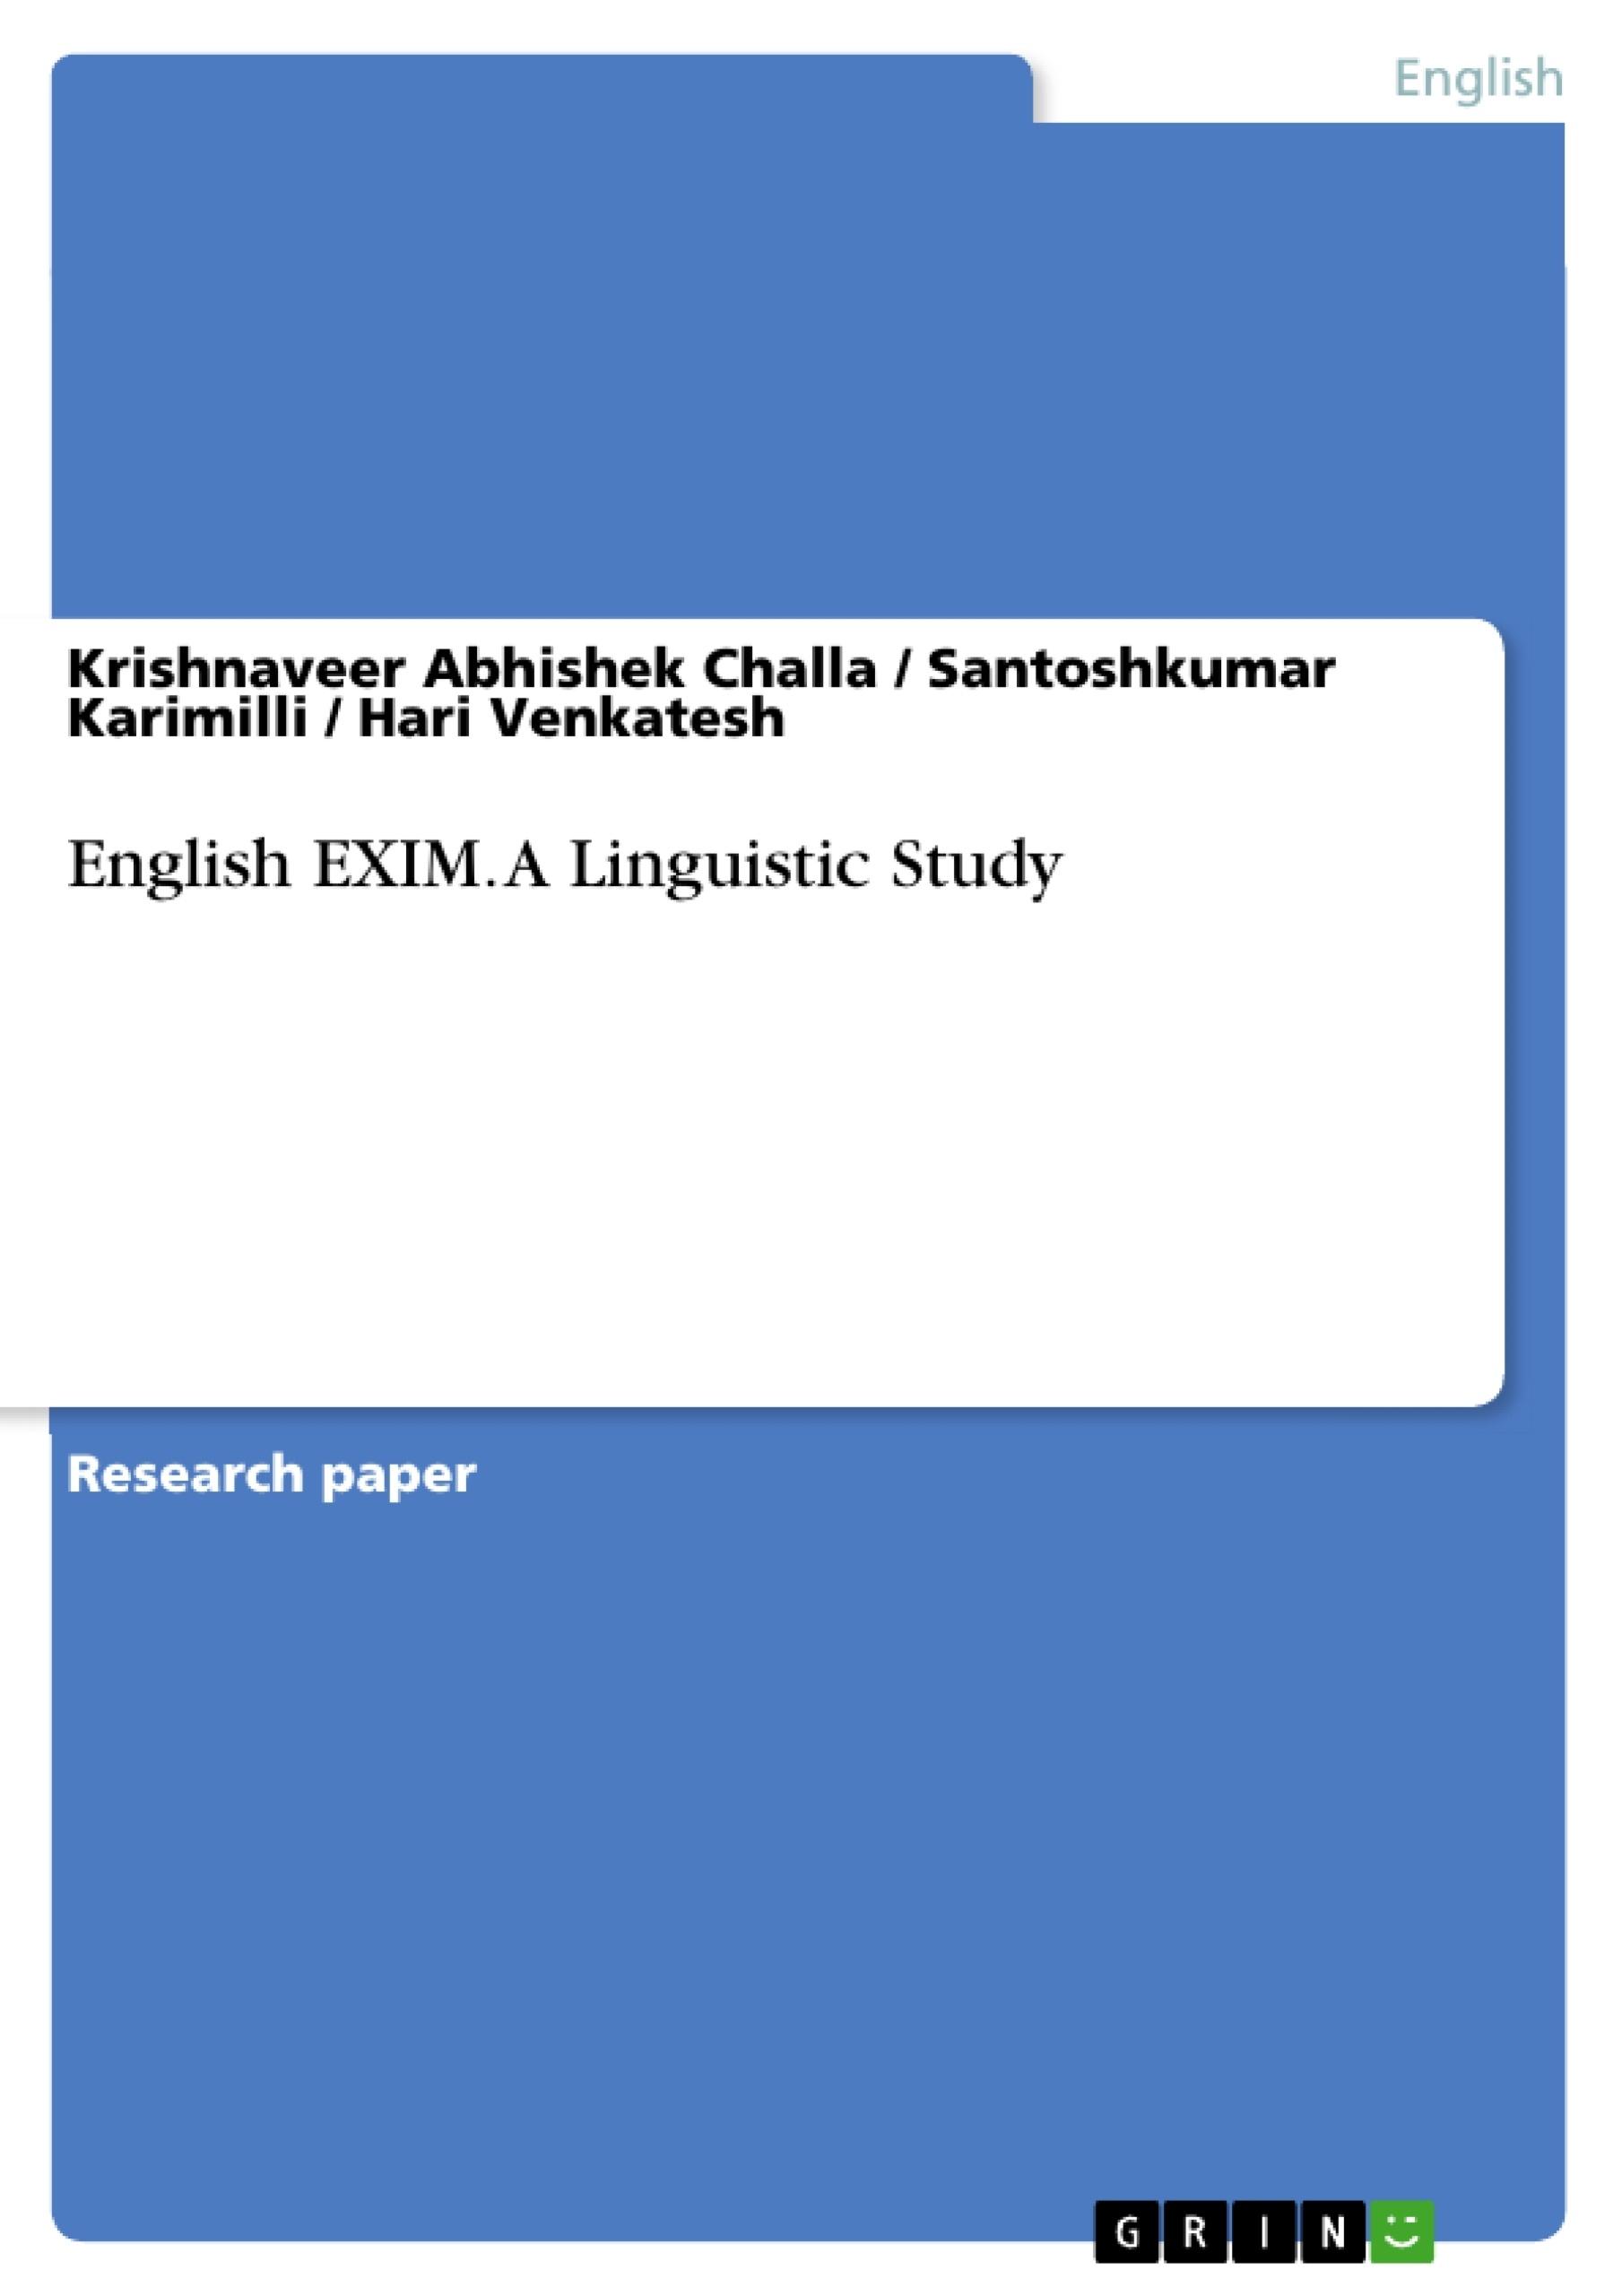 Title: English EXIM. A Linguistic Study